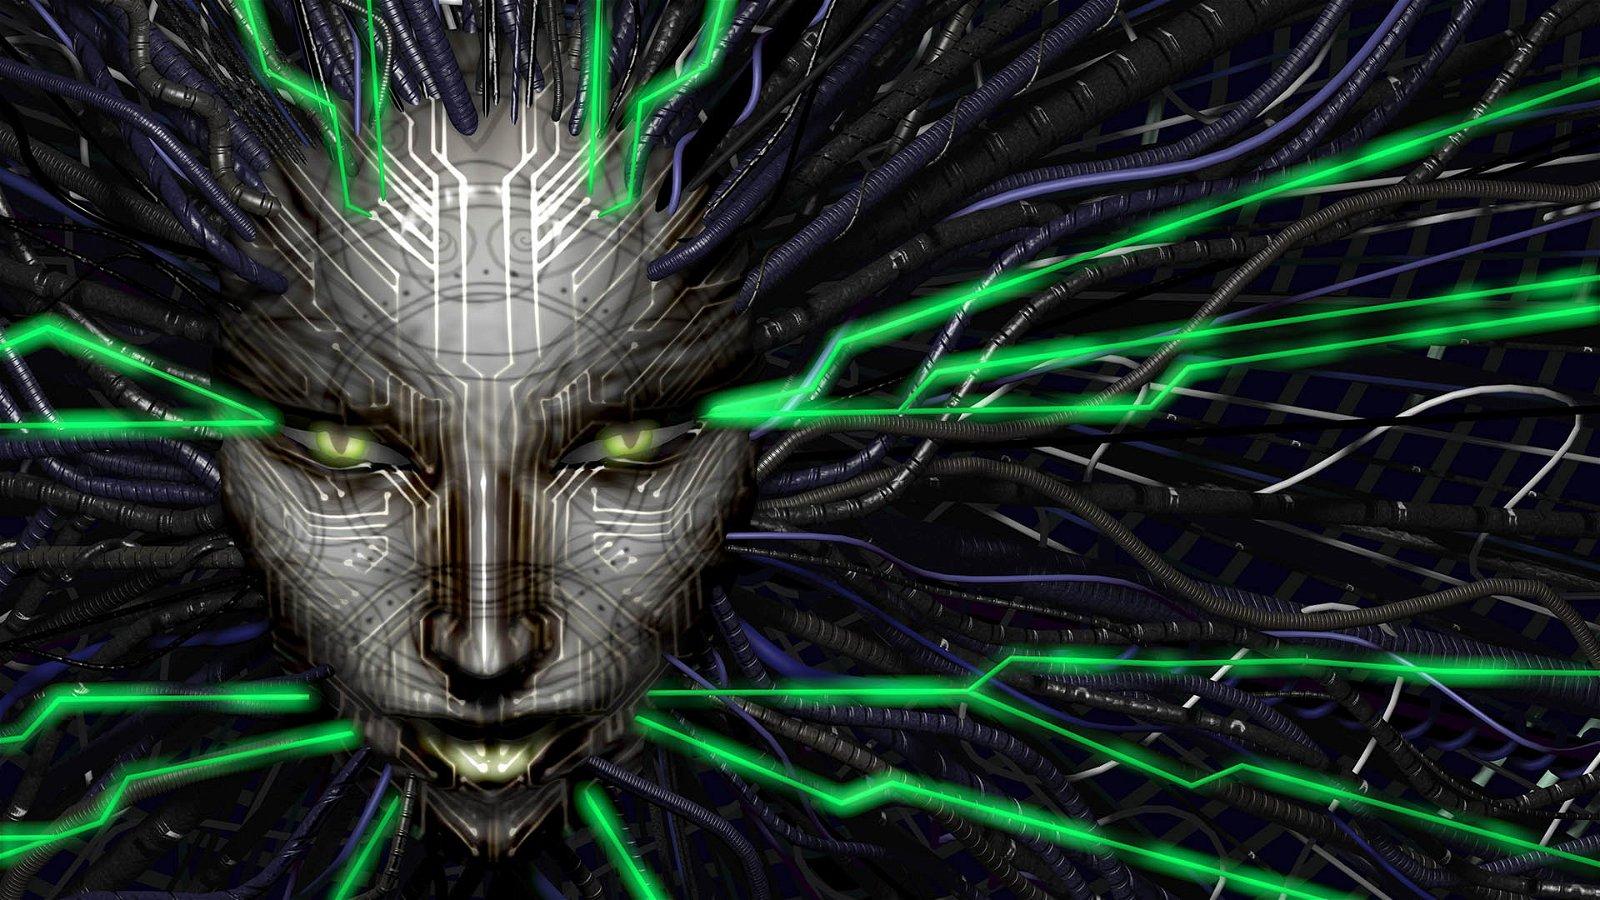 System Shock Remastered Goes on Indefinite Hiatus